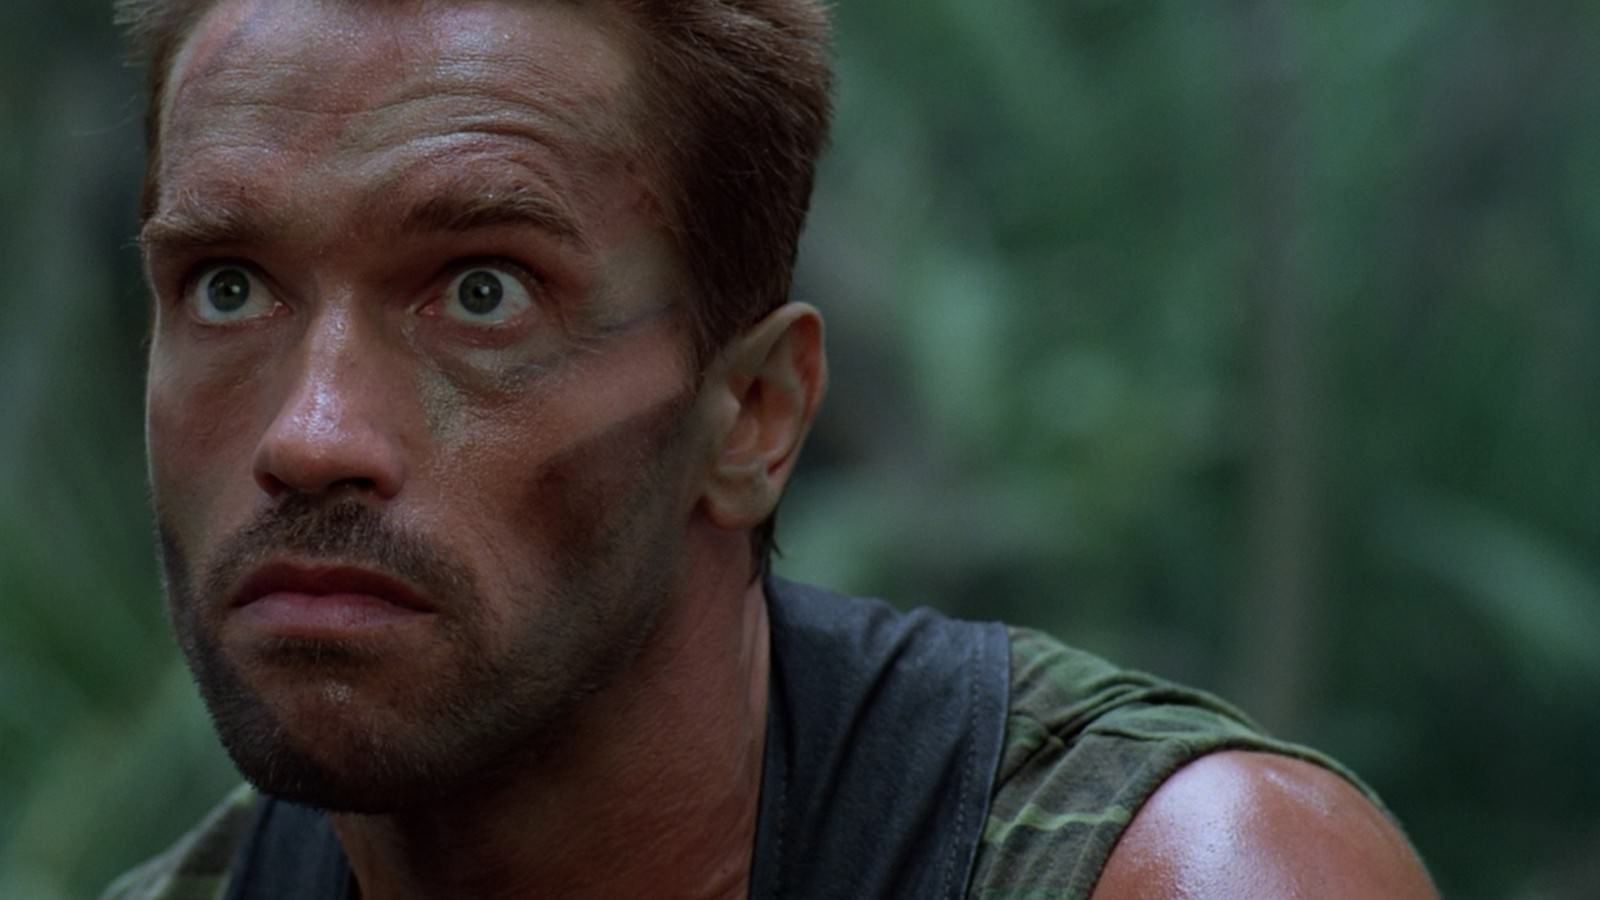 Movie, Predator(美國, 1987) / 終極戰士(台) / 铁血战士(中) / 鐵血戰士(港), 電影劇照